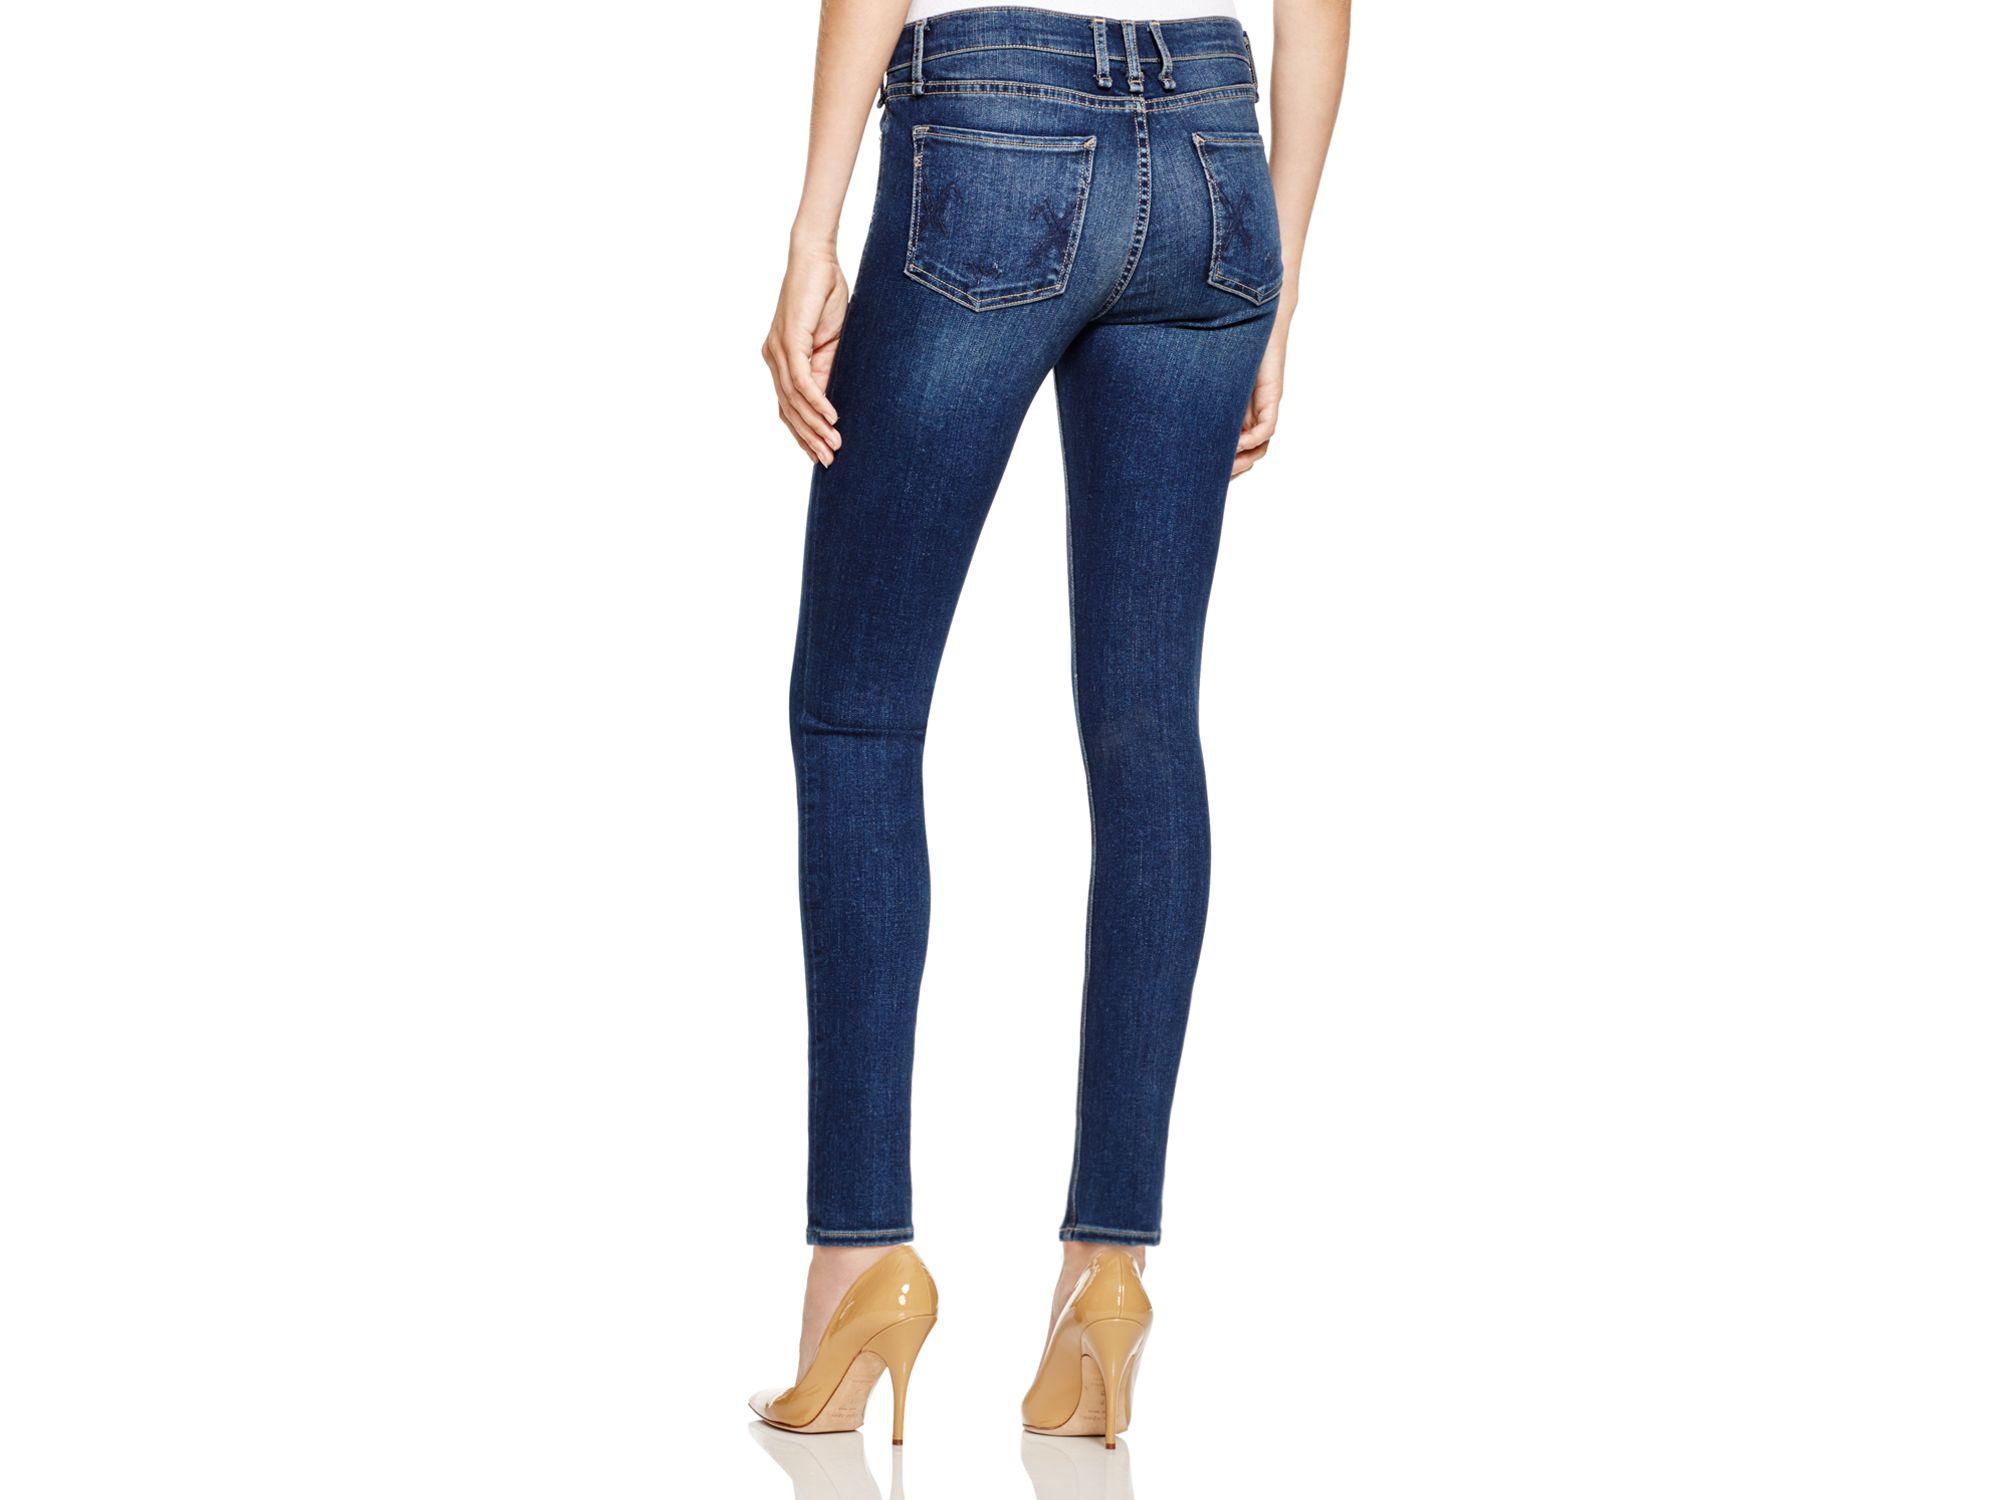 Mcguire Newton Skinny Ankle Jeans In Bijoux in Blue